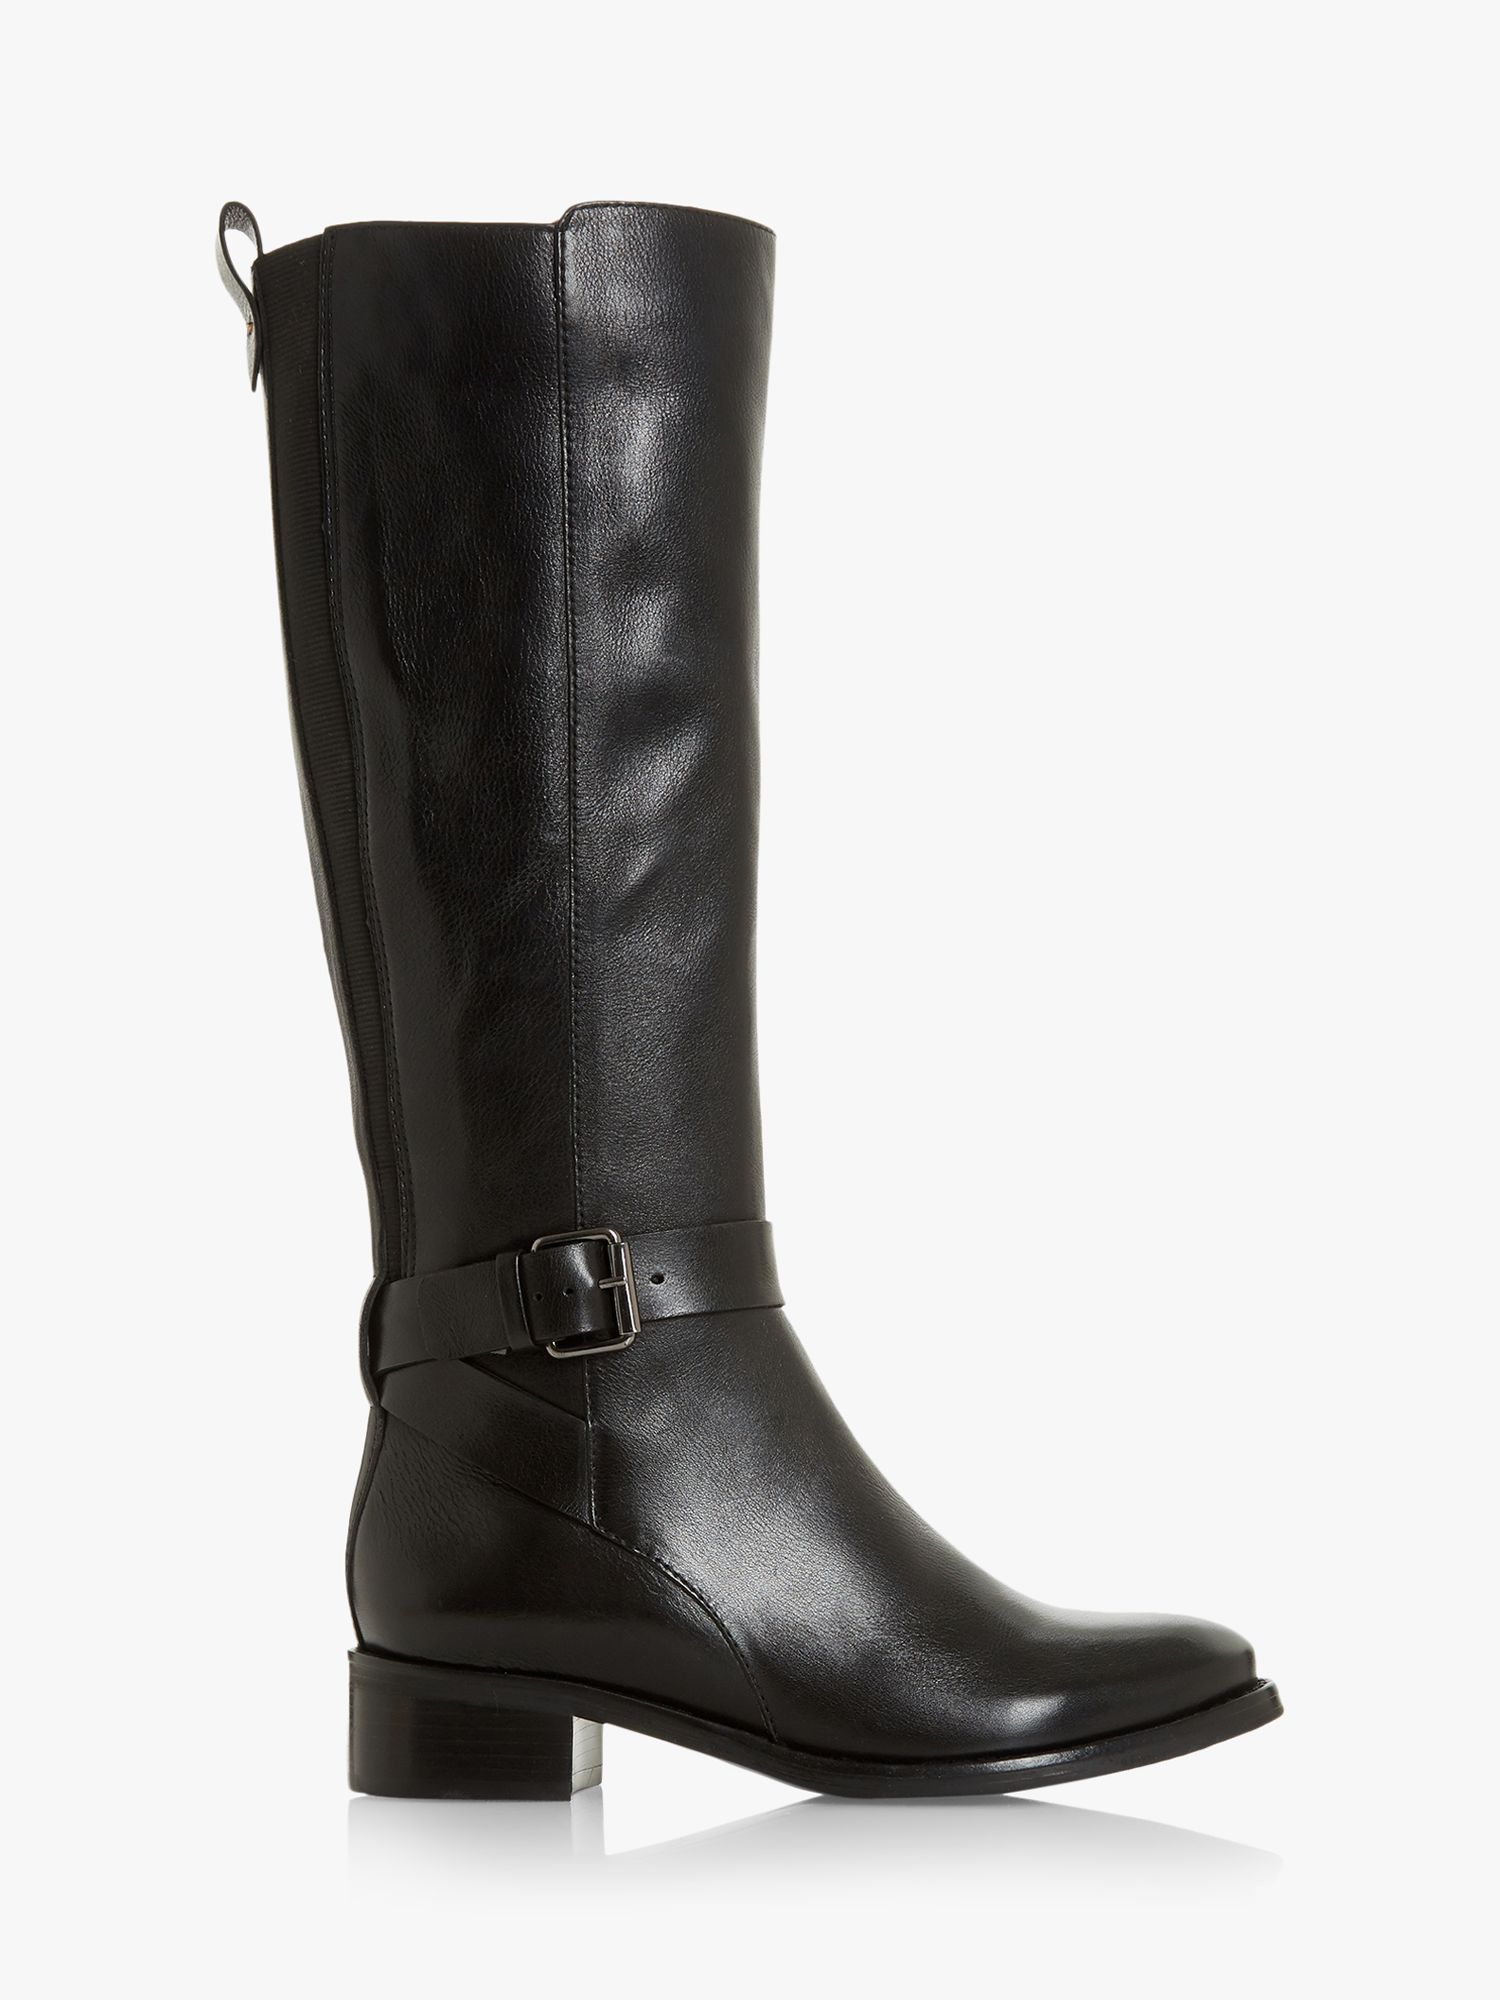 Bertie Bertie Taykonie Buckle Detail Leather Knee Boots, Black